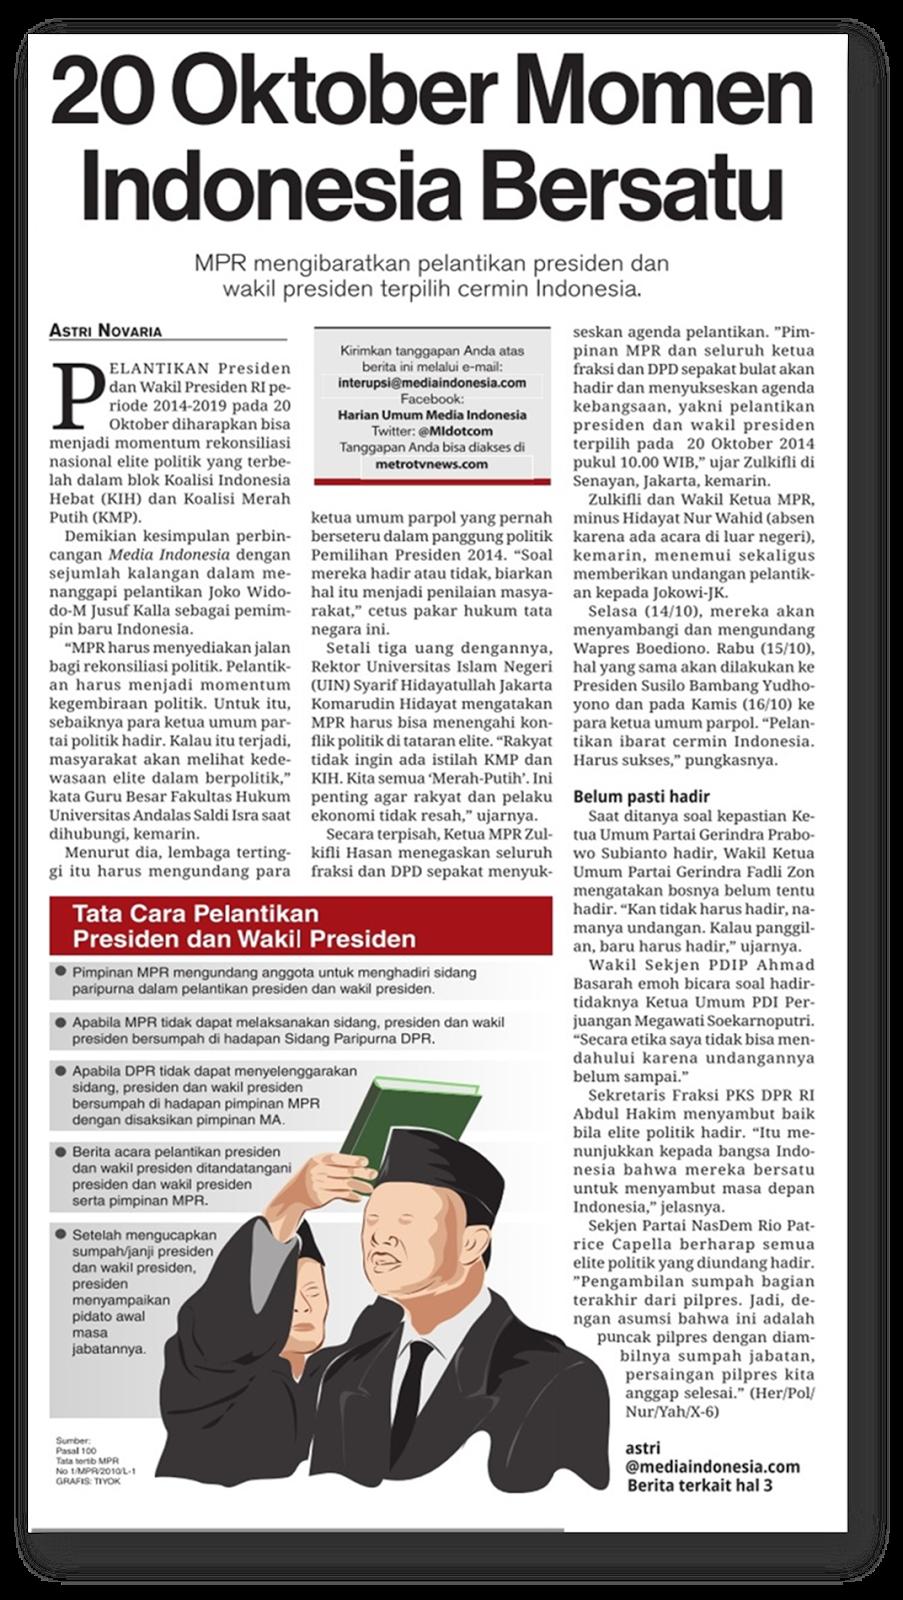 Tata Cara Pelantikan Presiden RI 2014-2019 Tanggal 20 Oktober 2014